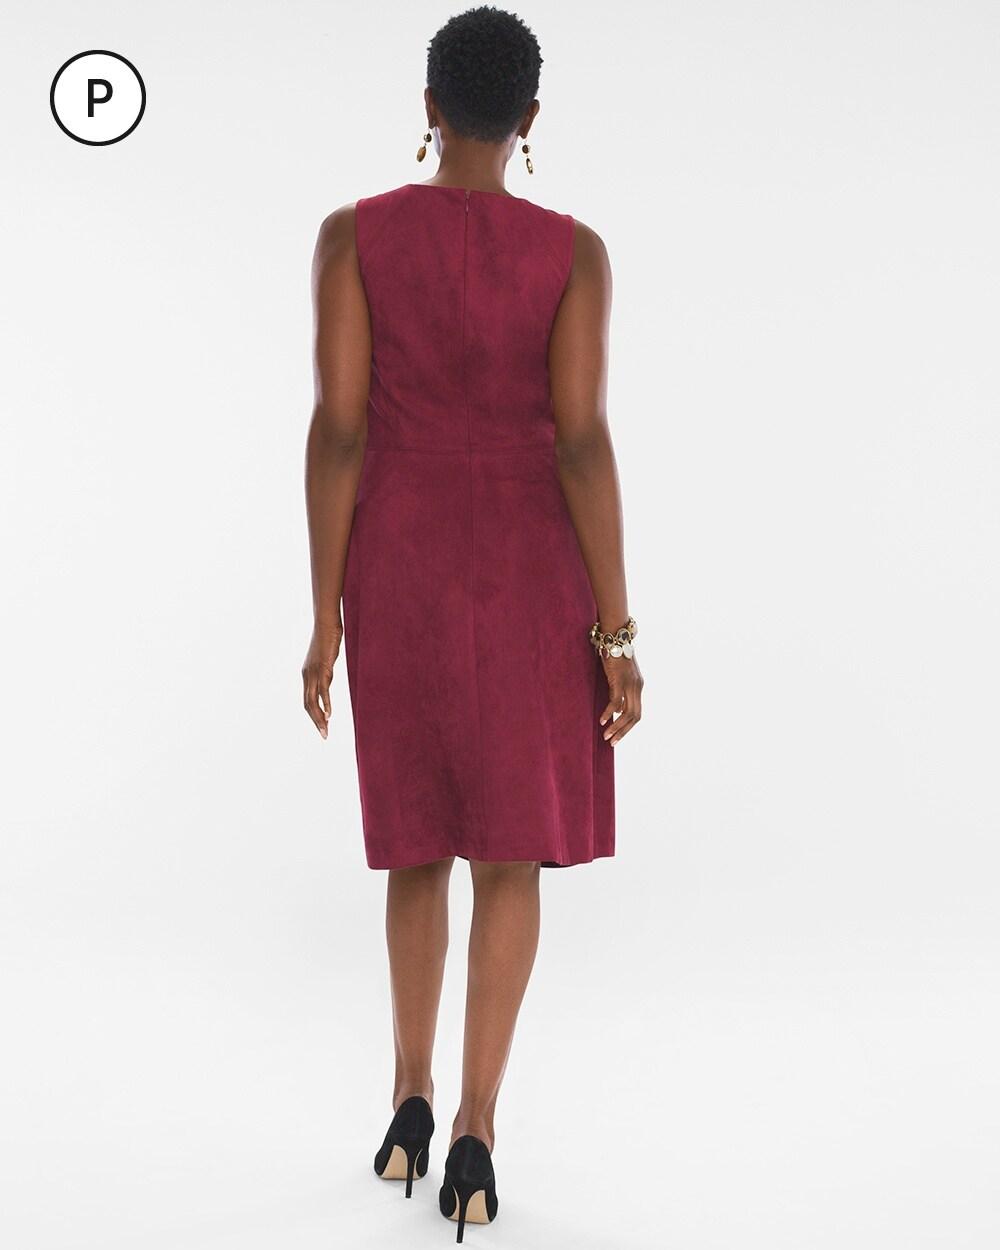 c3adab63 570244722. Video. Zoom. Petite Sueded Sheath Dress